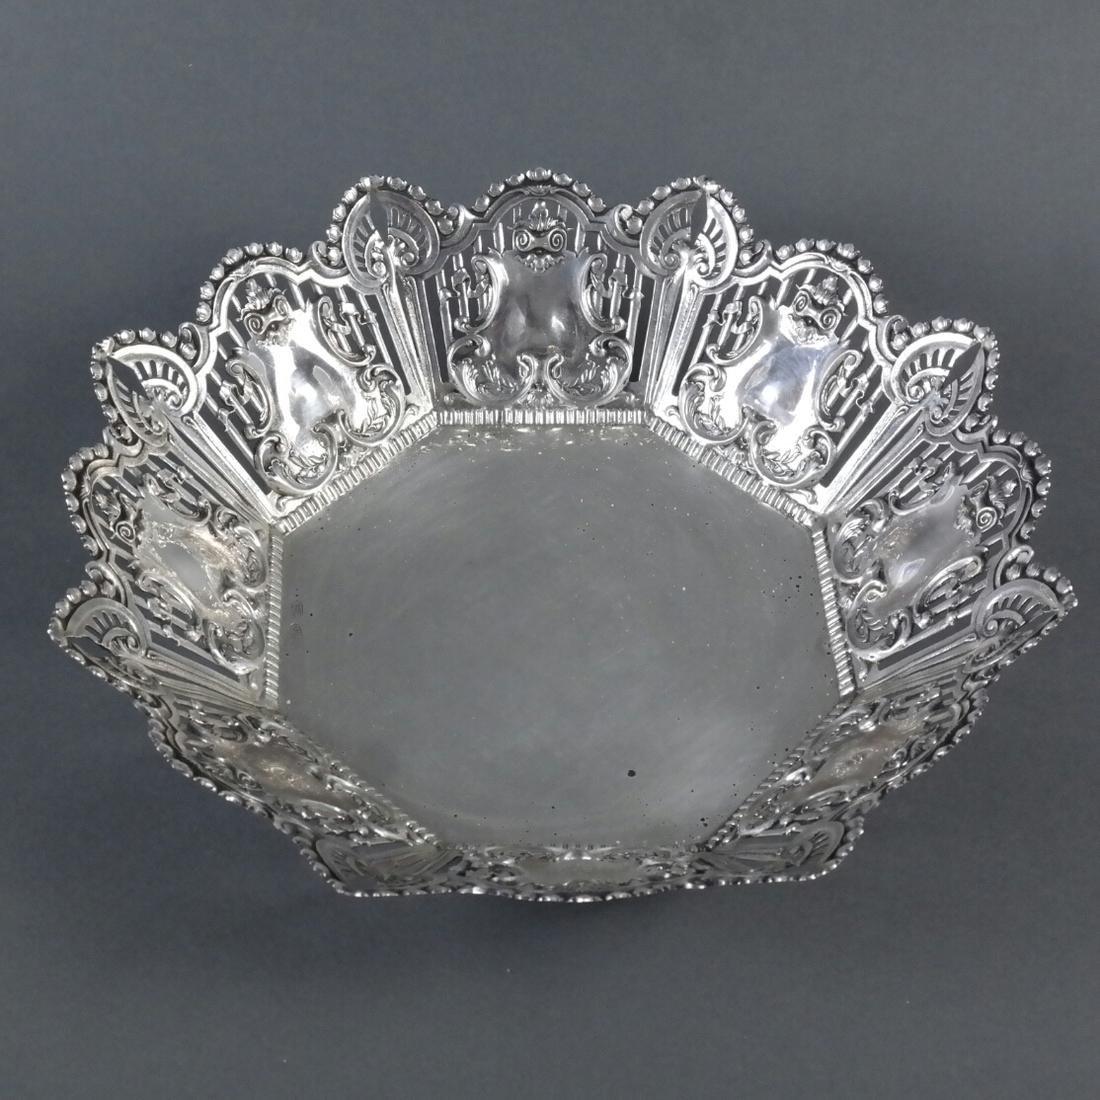 .900 Standard Silver Ornate Centerpiece